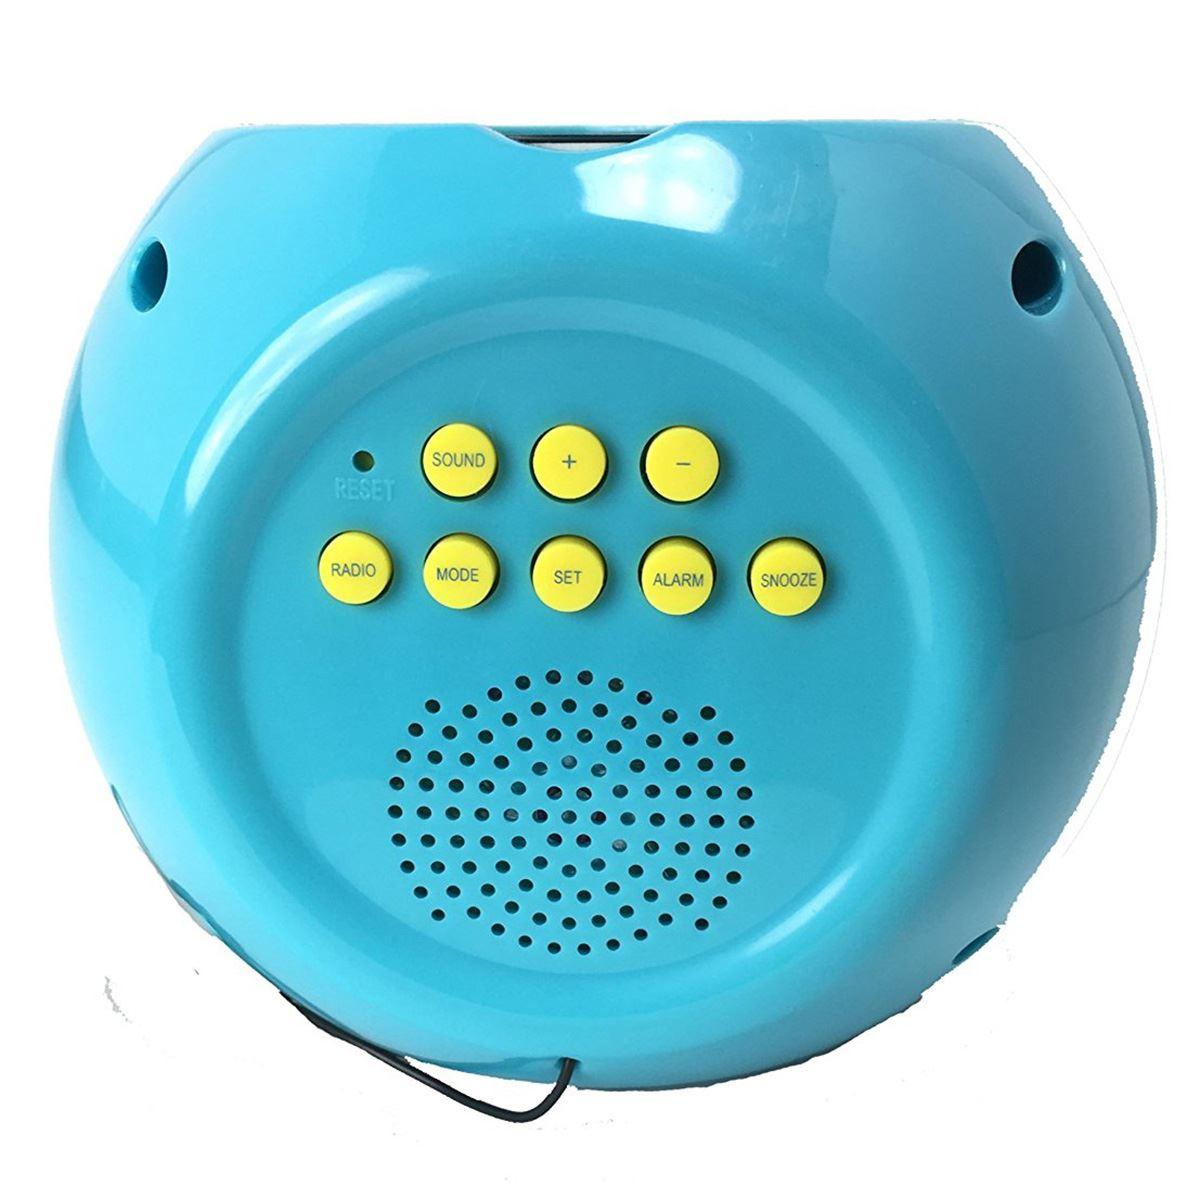 Projector Alarm Clock Radio Kids Pj Masks Disney